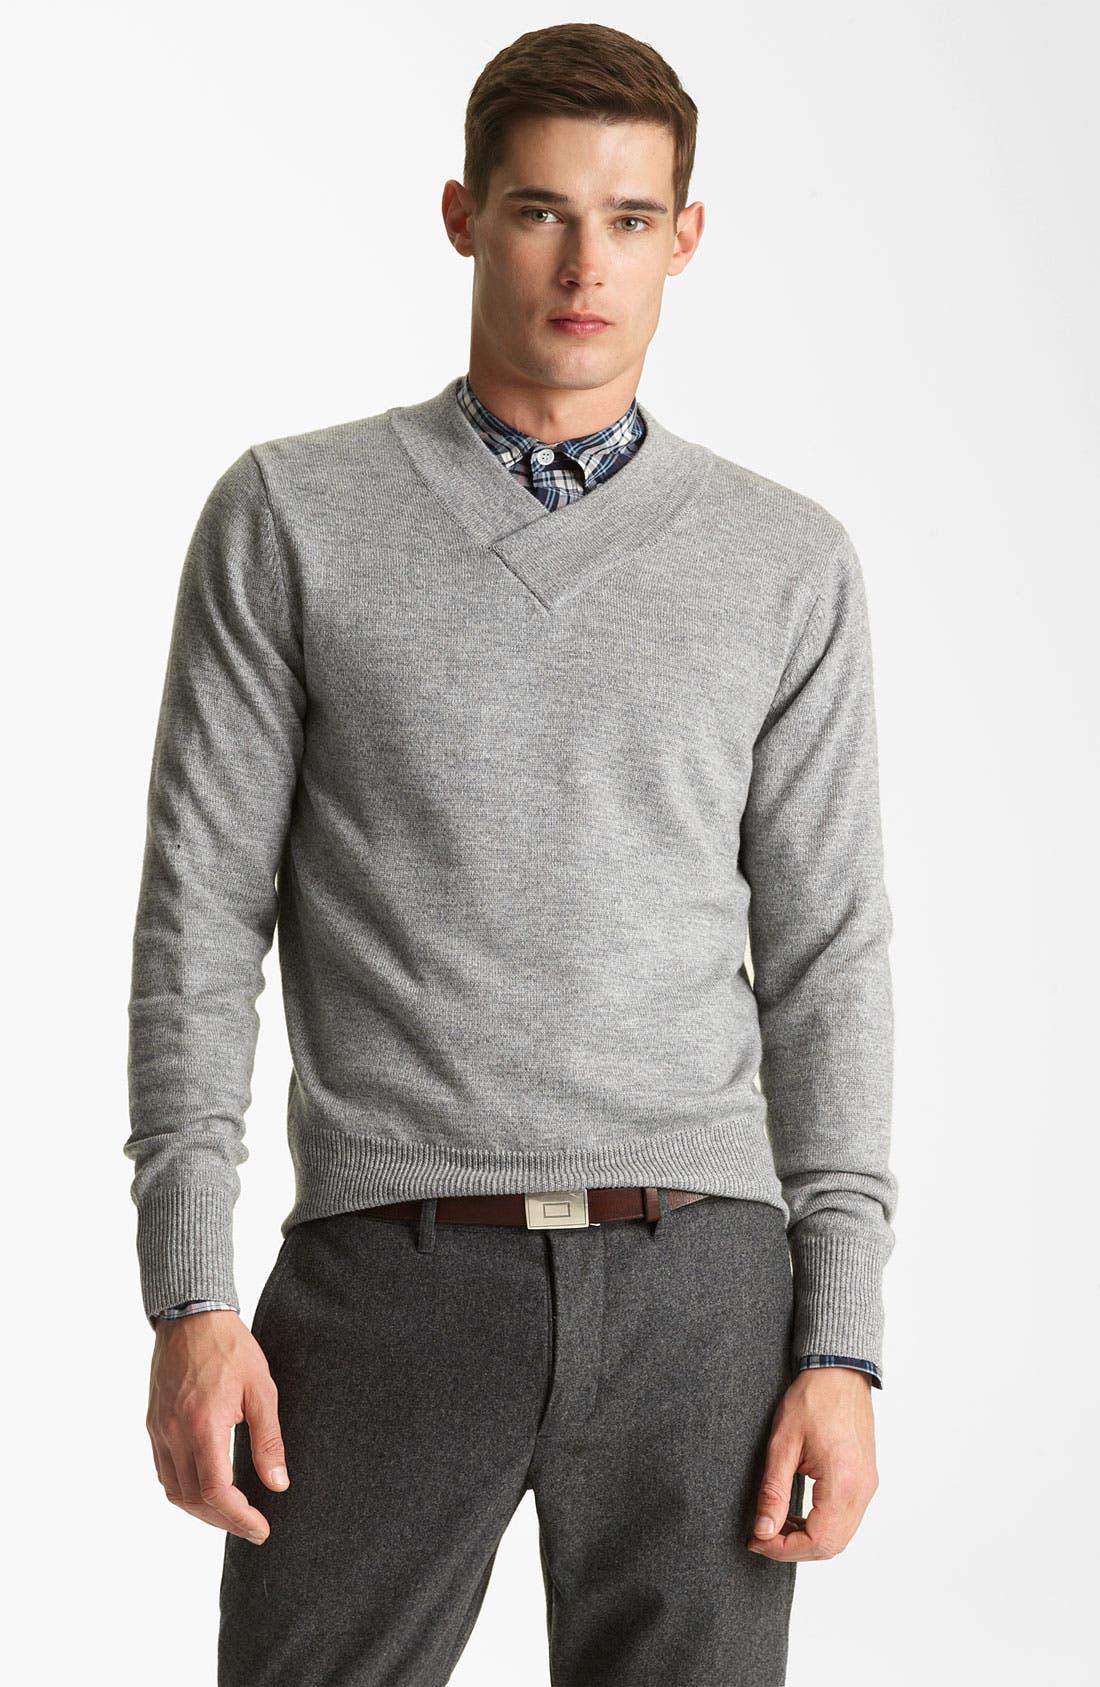 Alternate Image 1 Selected - Todd Snyder V-Neck Merino Wool Sweater